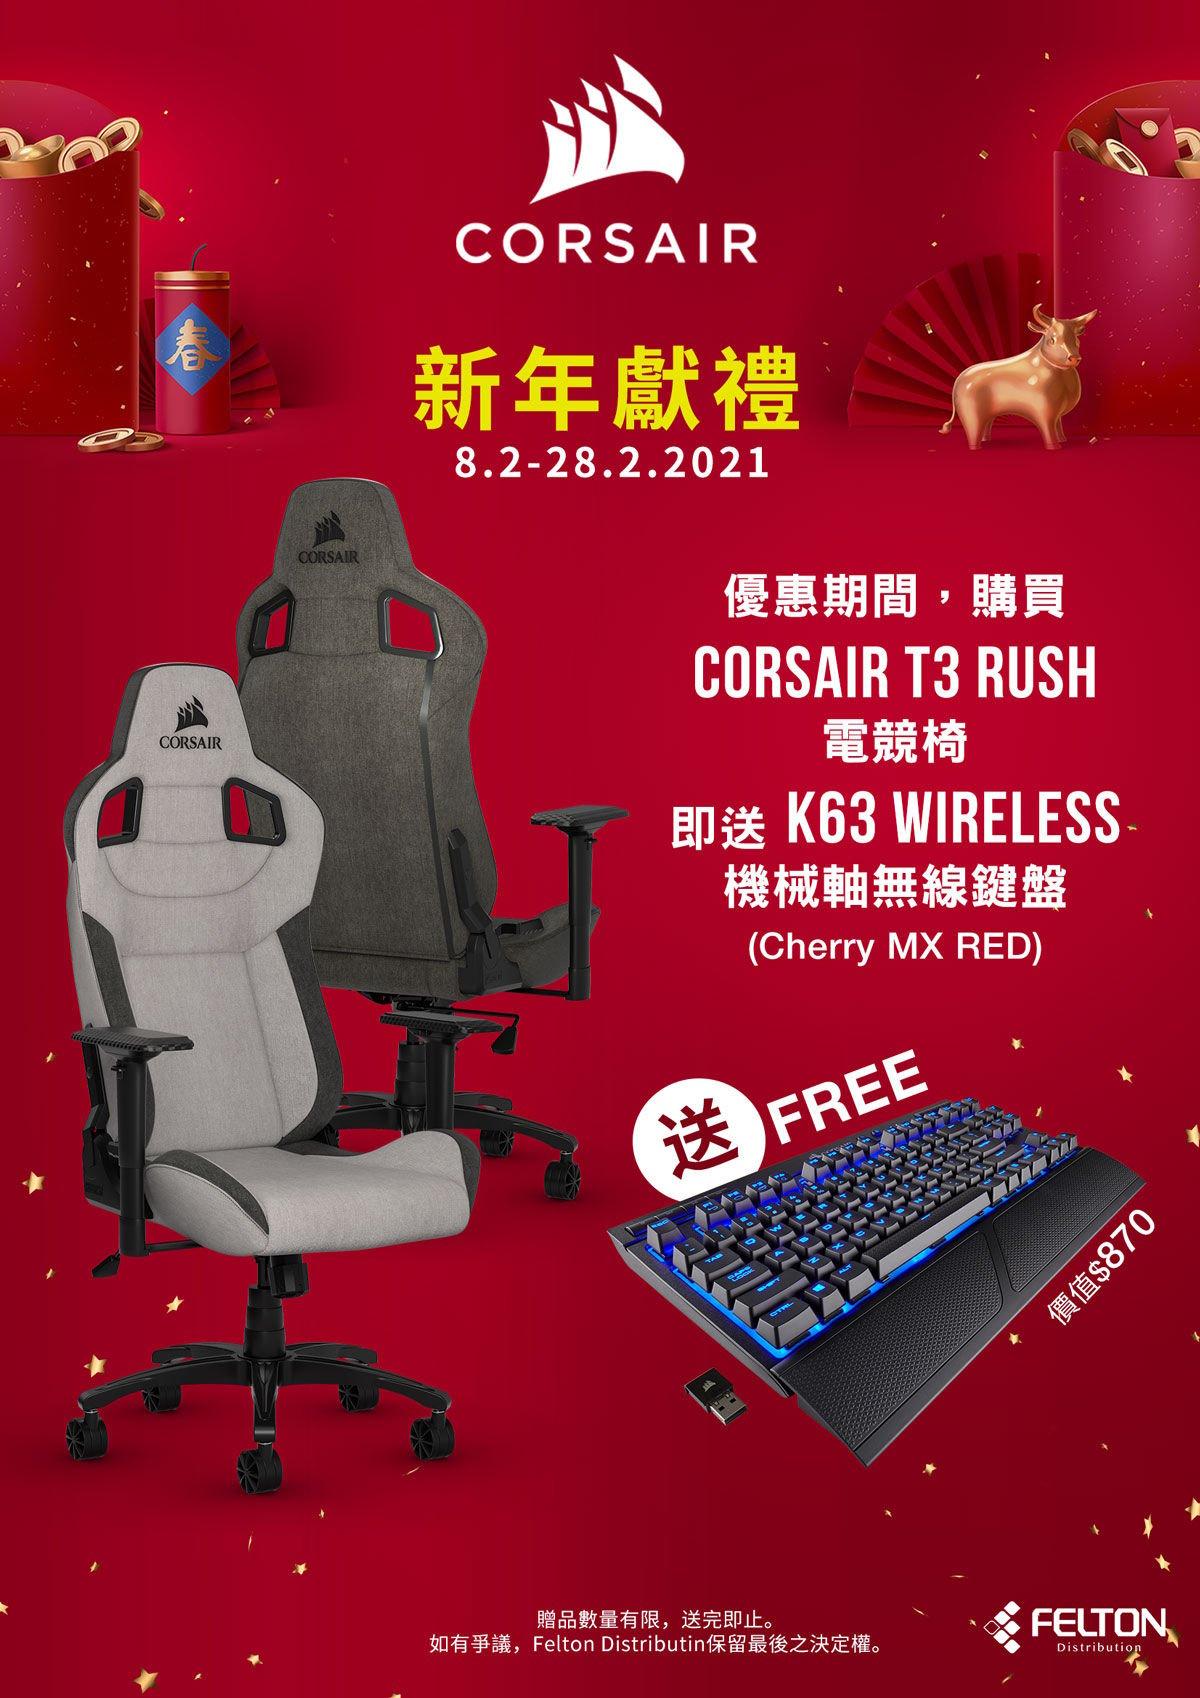 CORSAIR Gaming Chair Promo